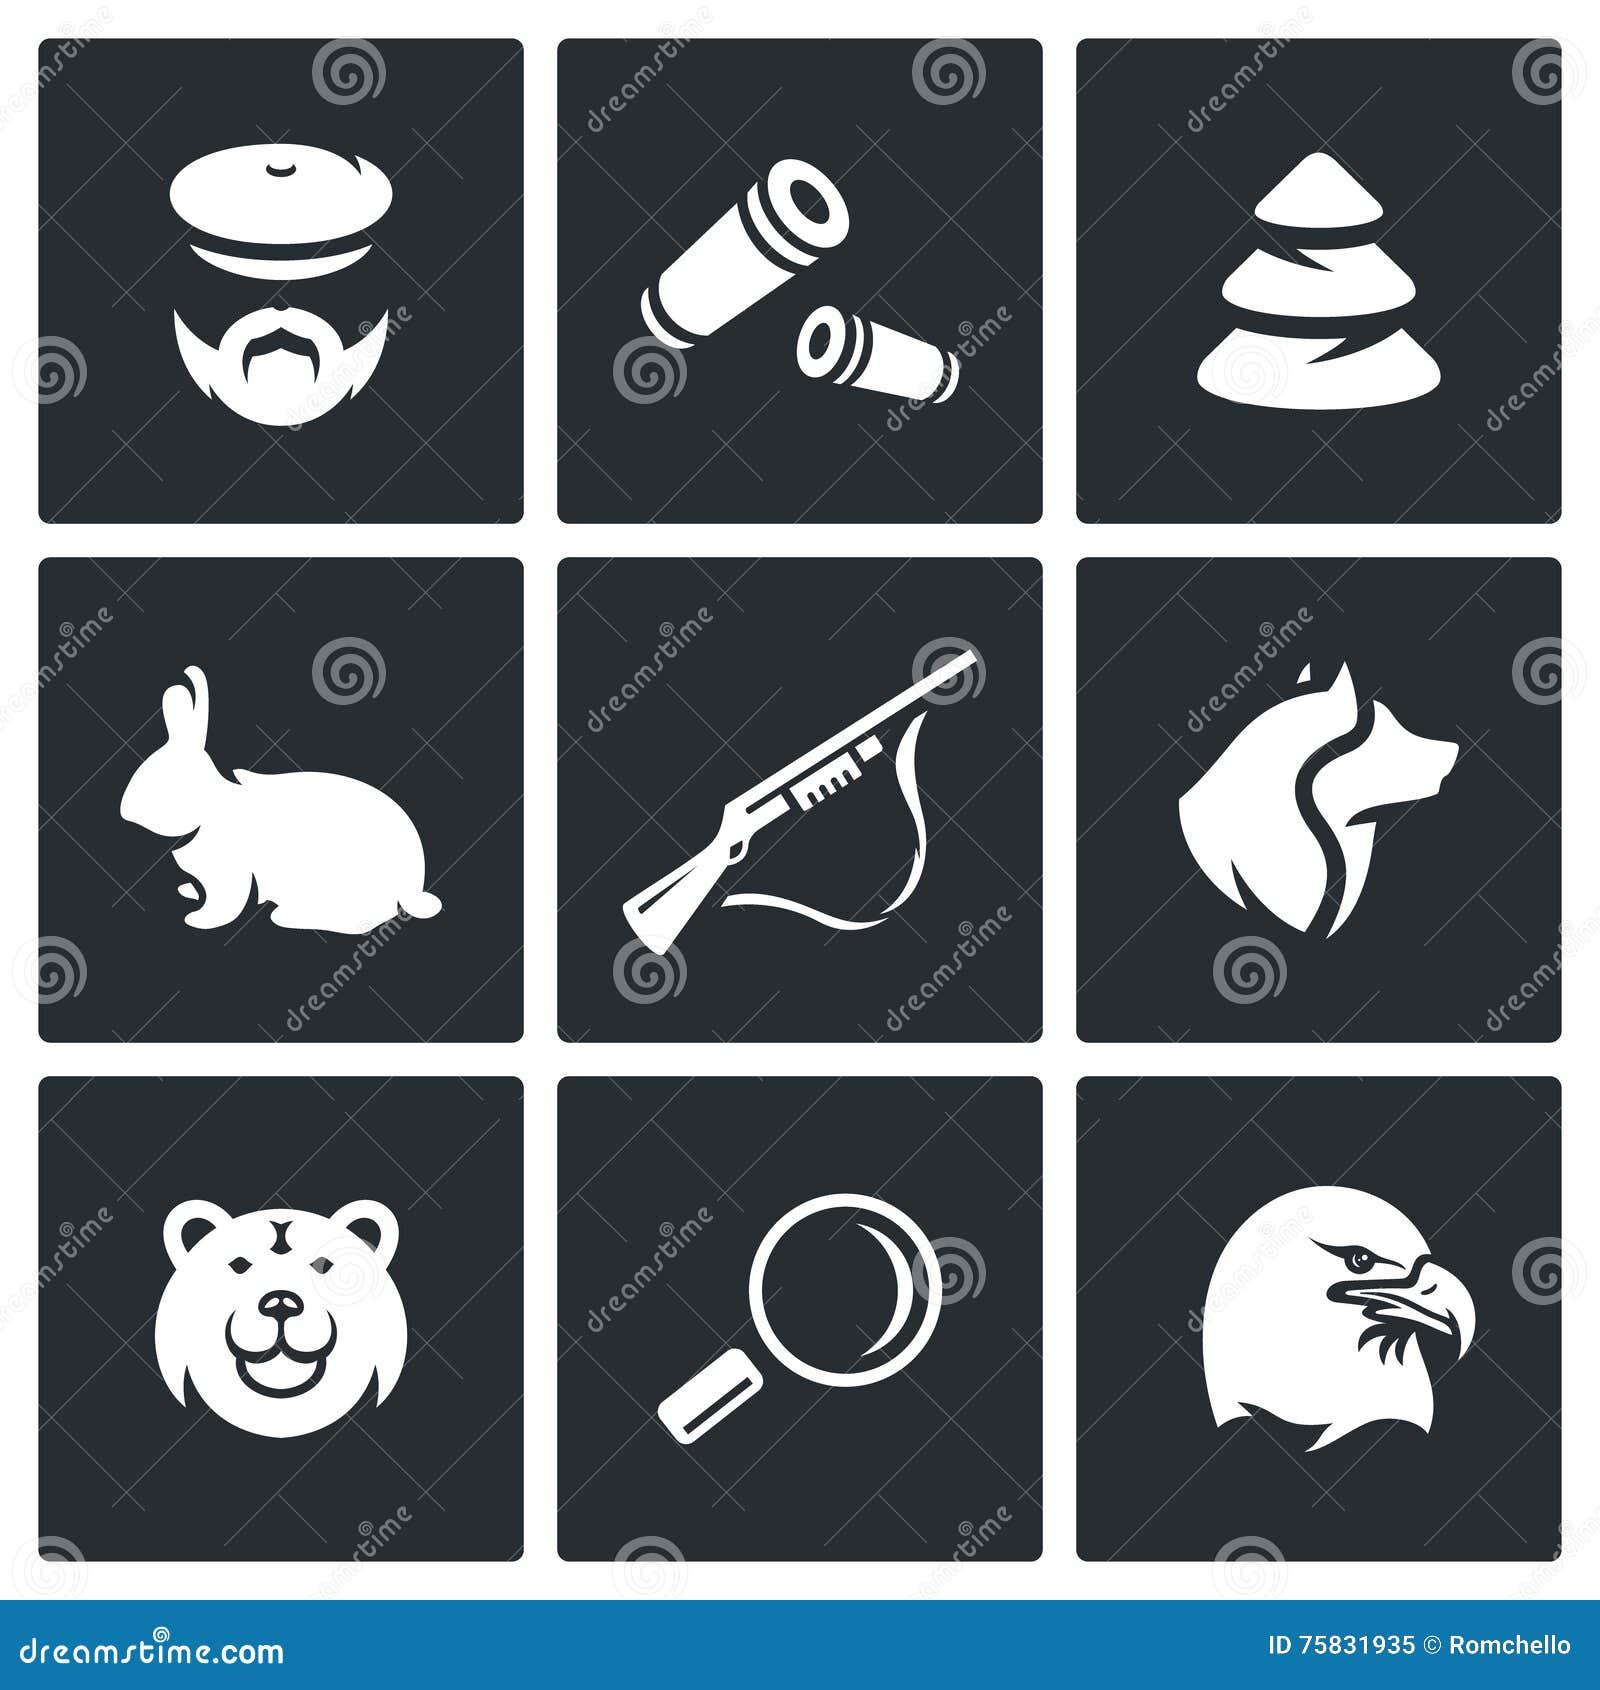 Vector Set of Hunting Icons. Hunter, Ammunition, Timber, Animal, Arms, Dog, Predator, Search, Bird.